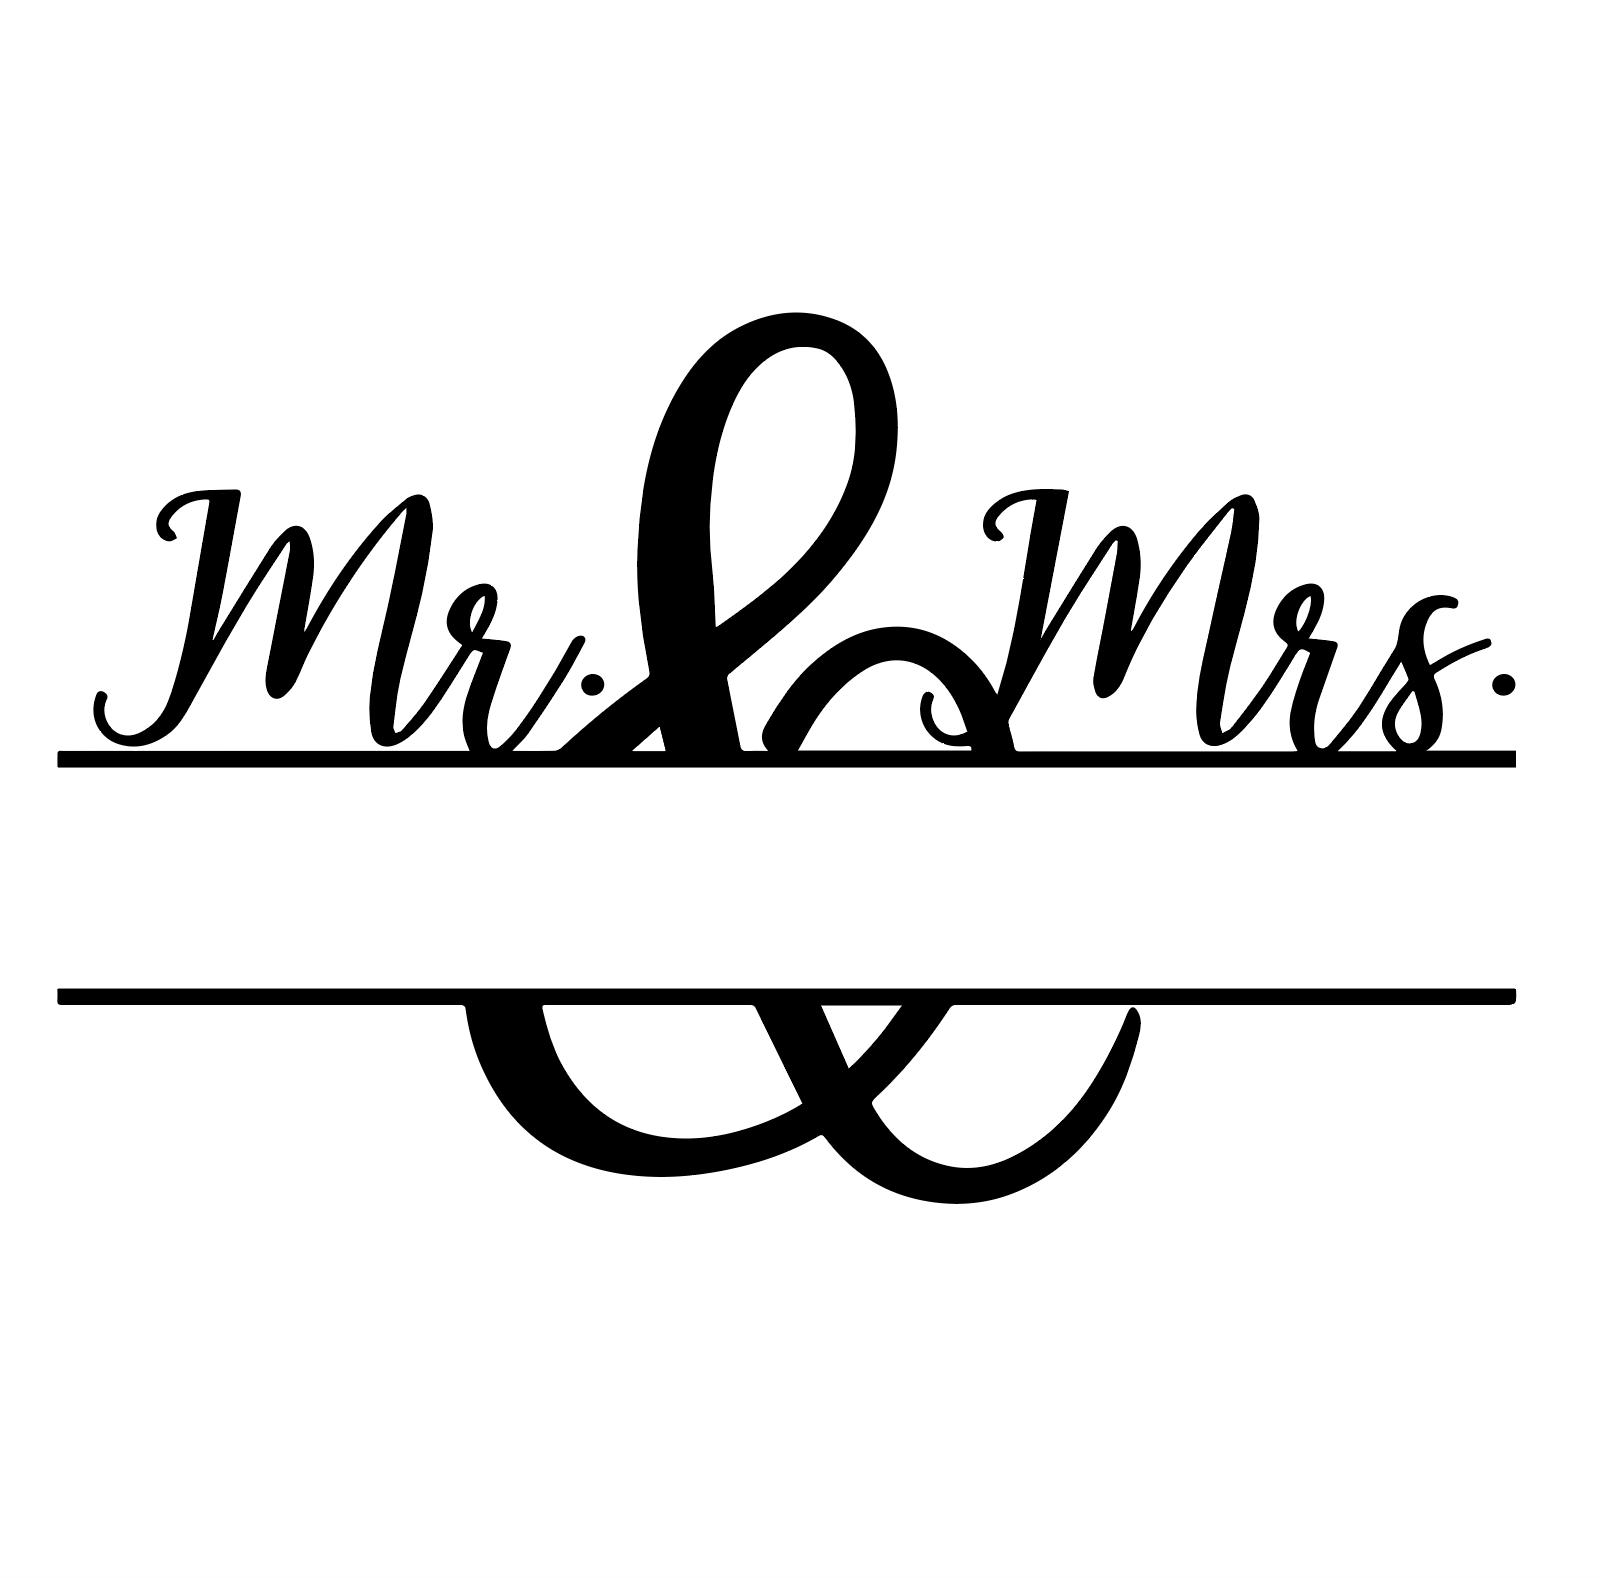 Herr Und Frau Frau Herr Nahttablo Und Cricut Monogram Cricut Monogram Font Lettering